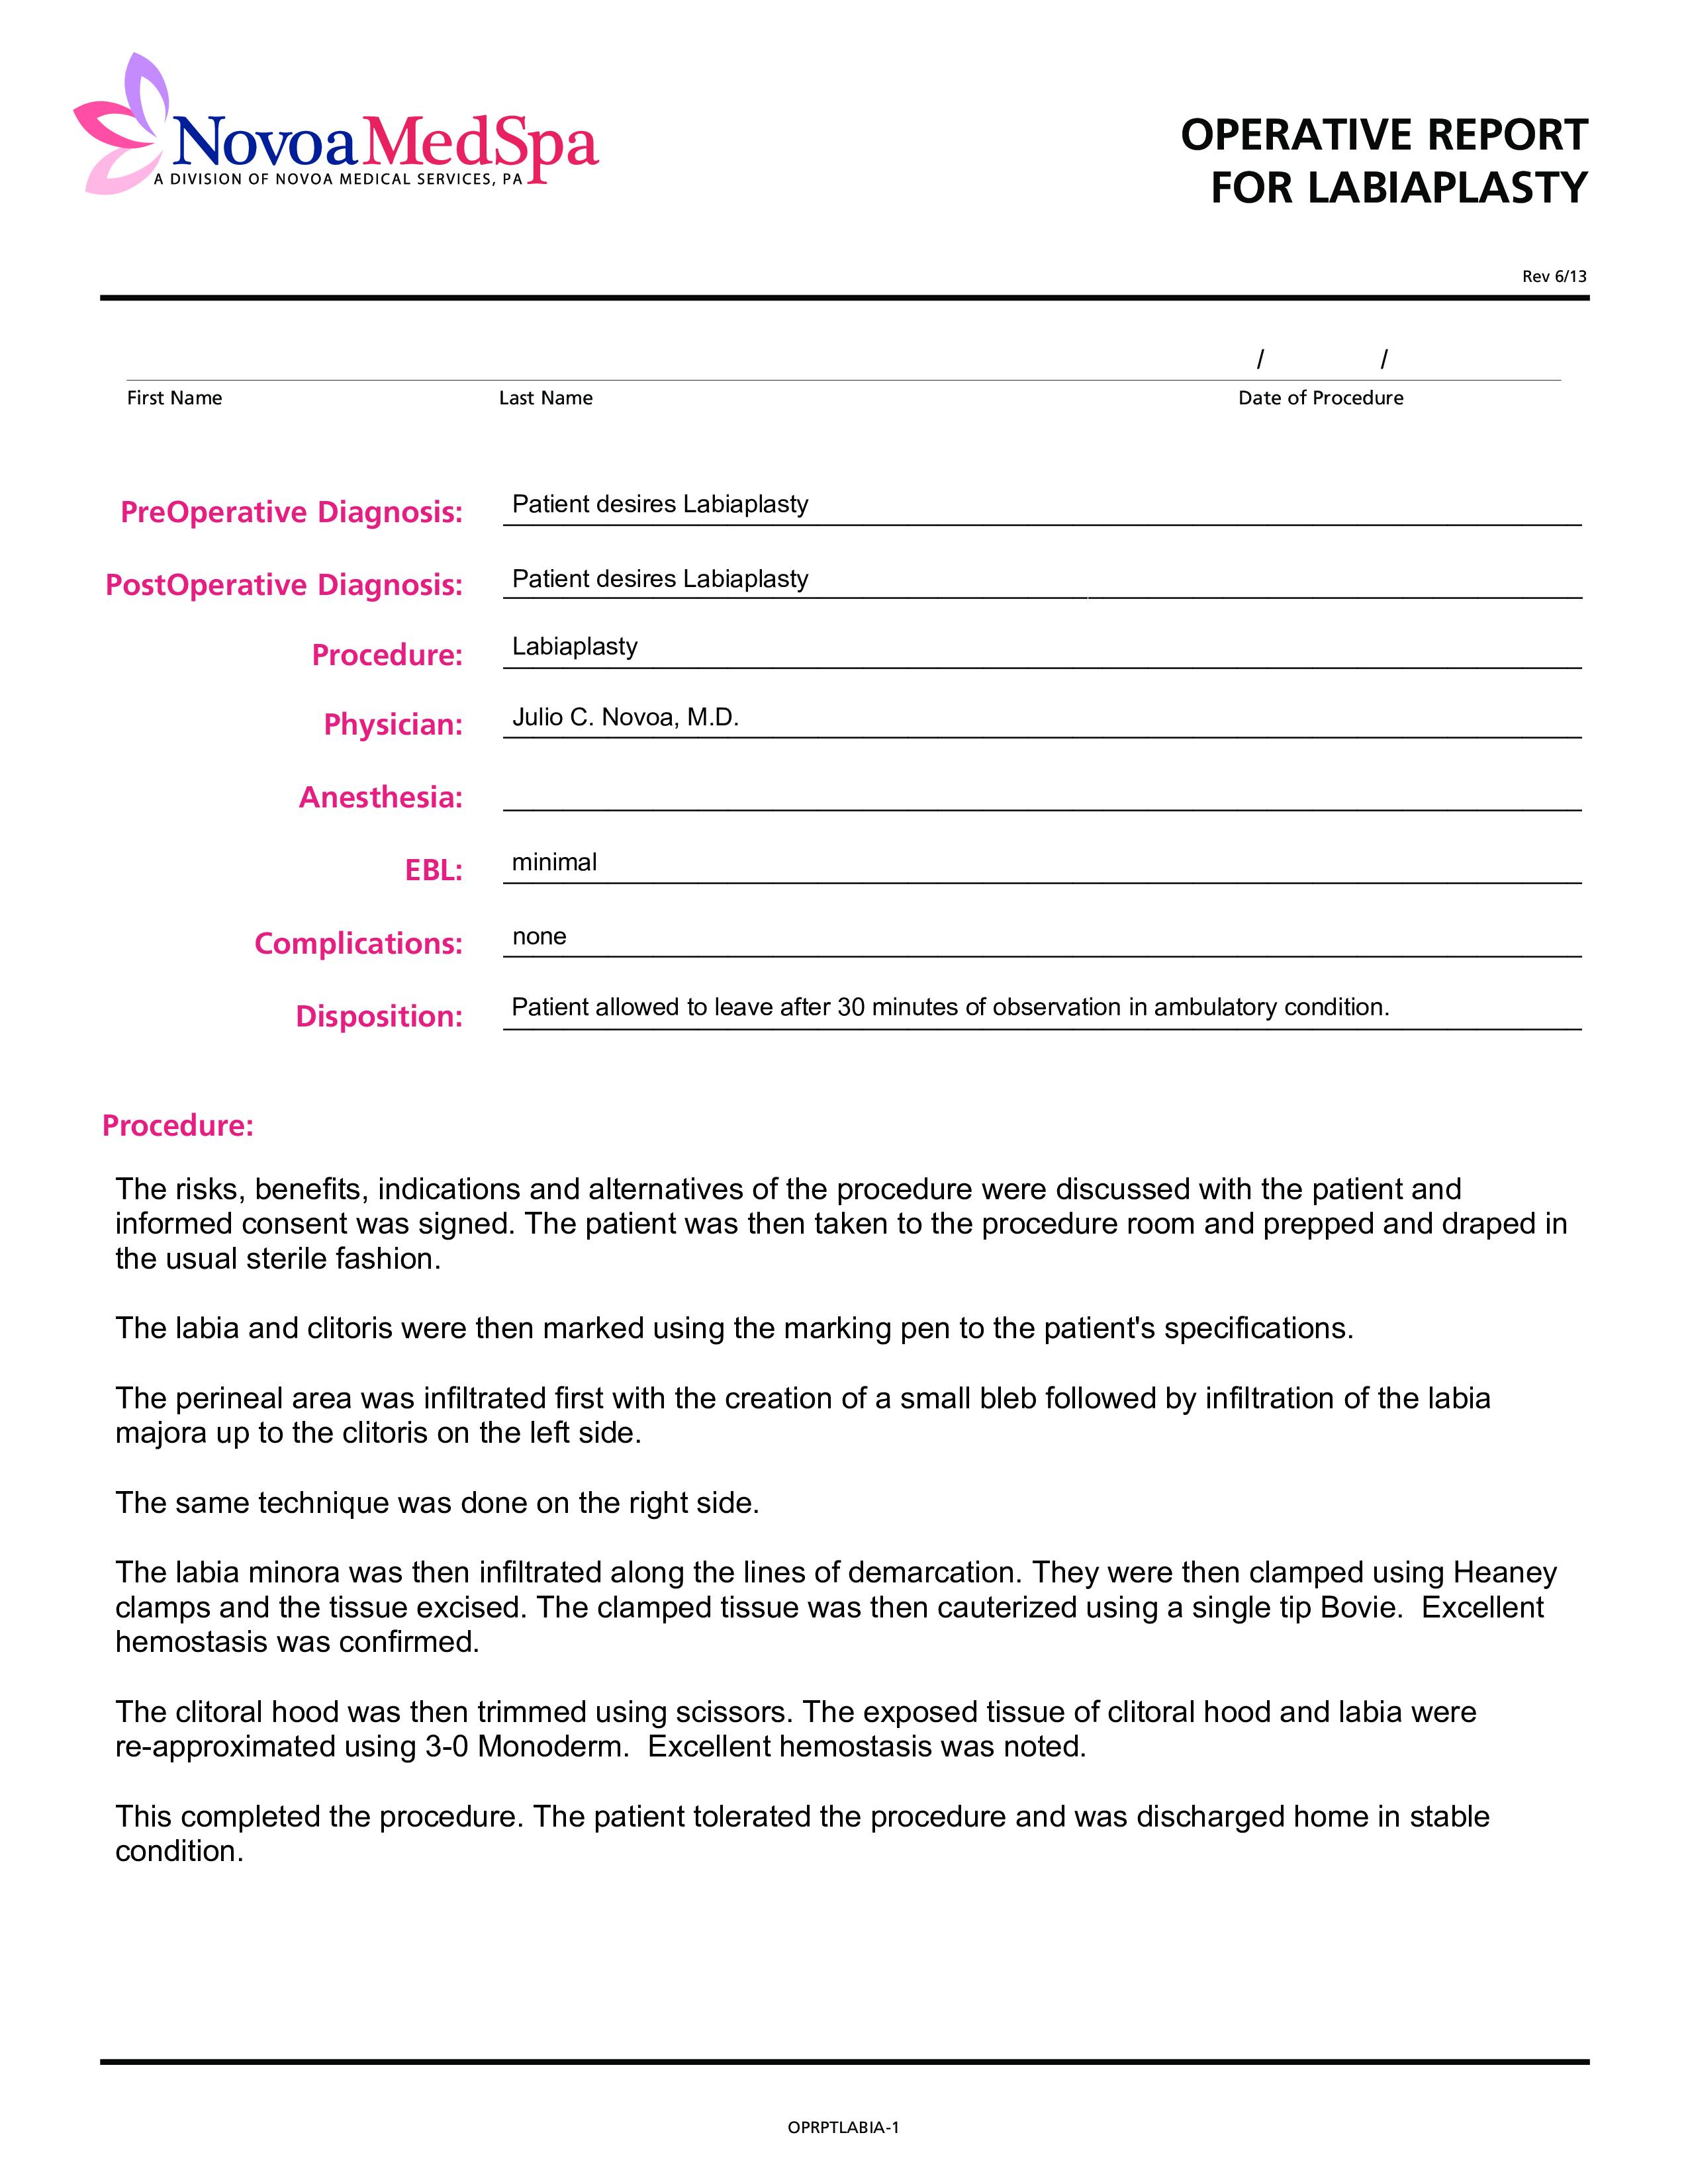 Operative Report  Templates At Allbusinesstemplates In Operative Report Template